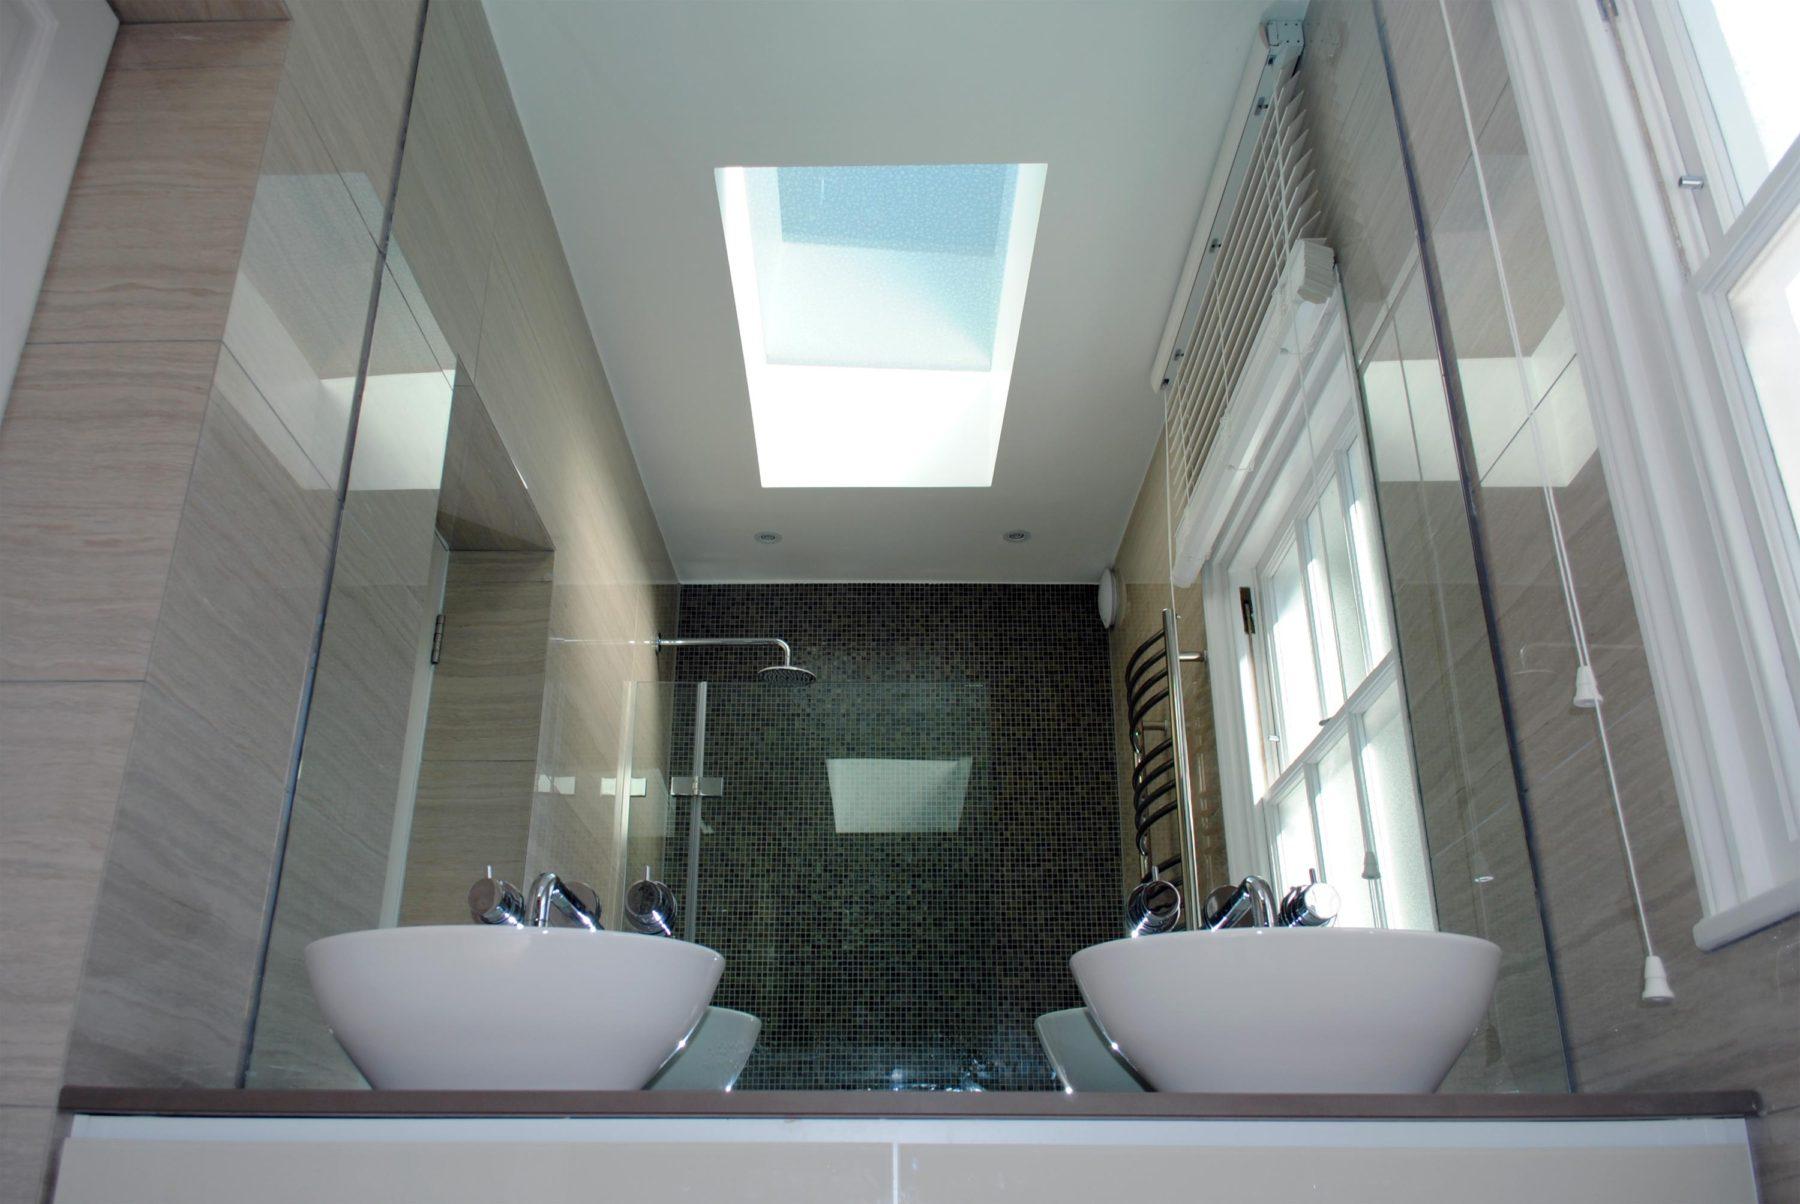 Walpole St 02 Internal Bathroom Refurbishment